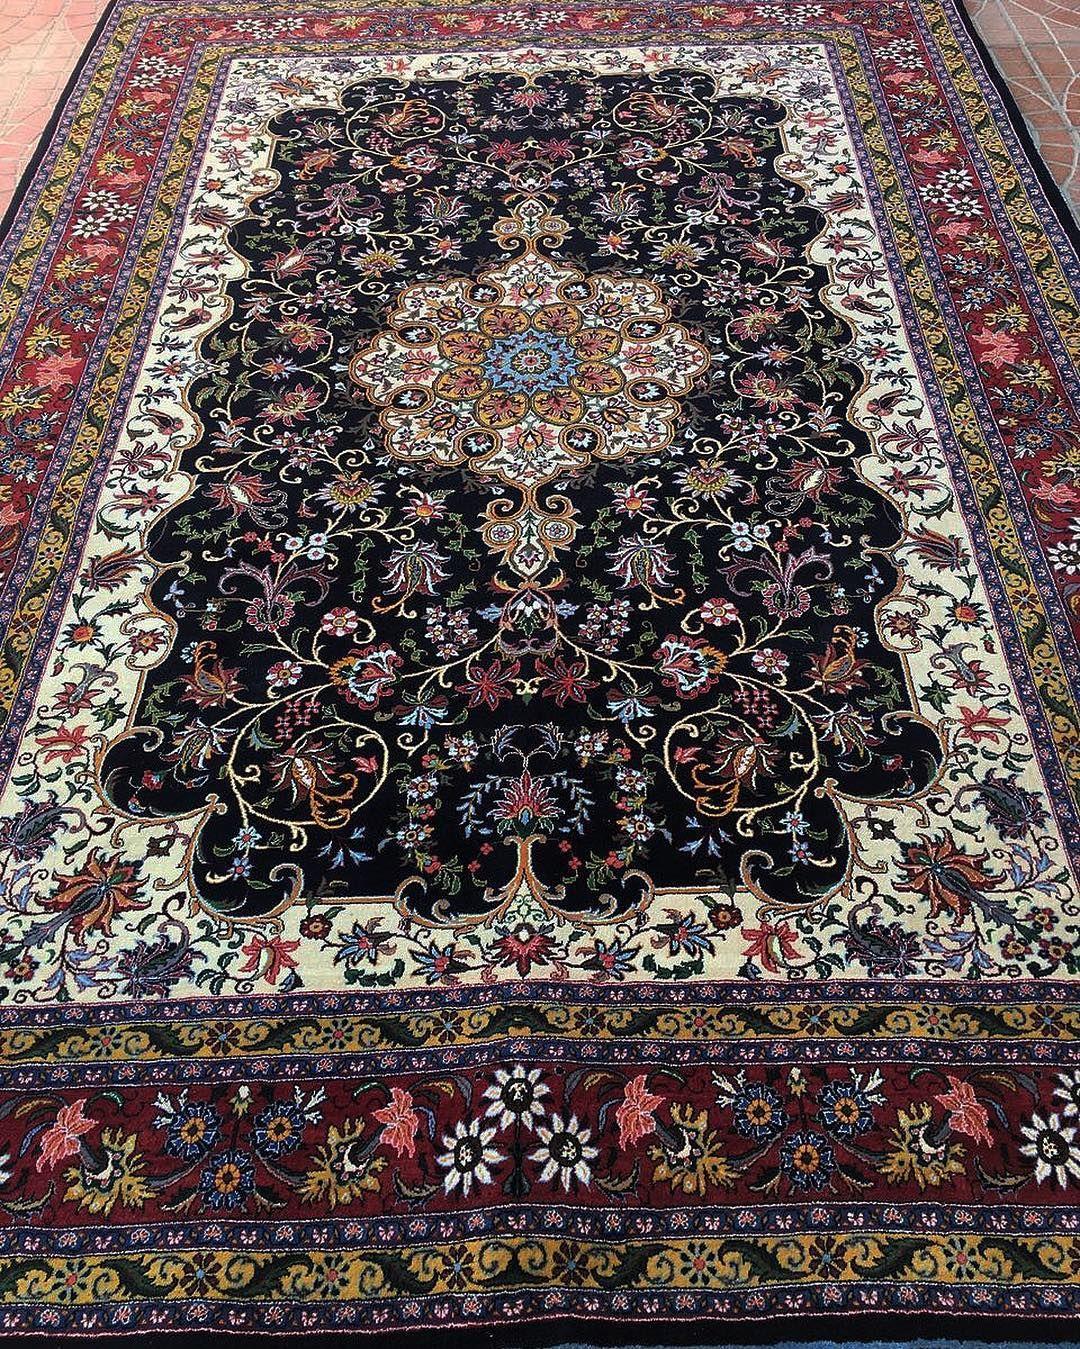 Silk Carpet World Address Silk Carpet World D 12 213 Rohini Sector 7 New Delhi Whatsapp 919355336661 Silkca Carpet World Silk Carpet Carpet Stores